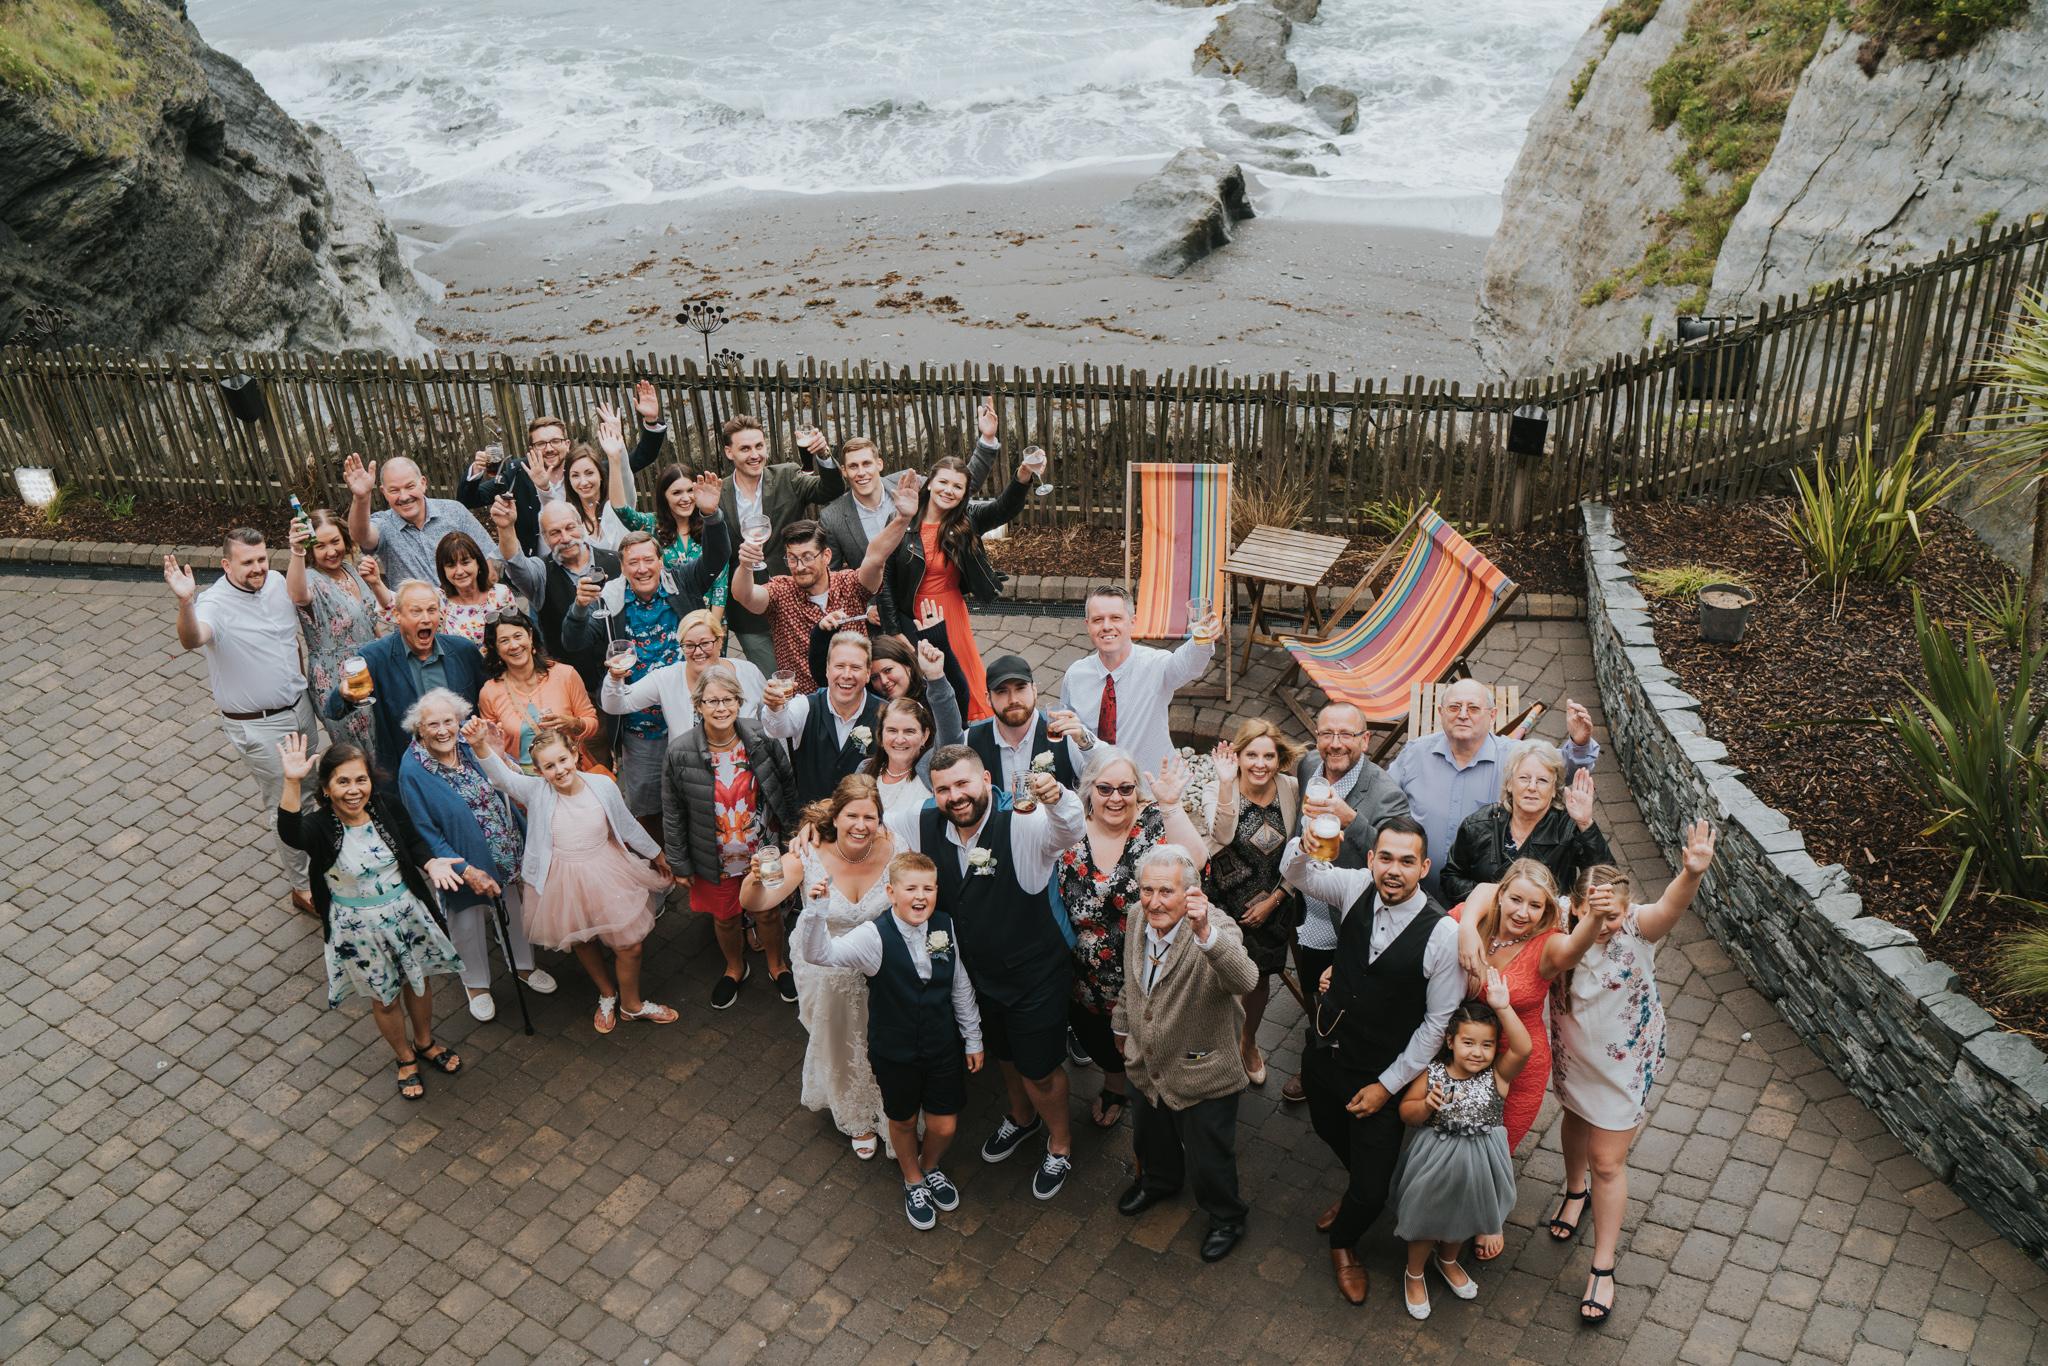 john-amy-relaxed-beach-wedding-tunnels-beaches-ilfracombe-north-devon-grace-elizabeth-colchester-essex-alternative-relaxed-wedding-photography-devon-suffolk-norfolk-essex (125 of 159).jpg